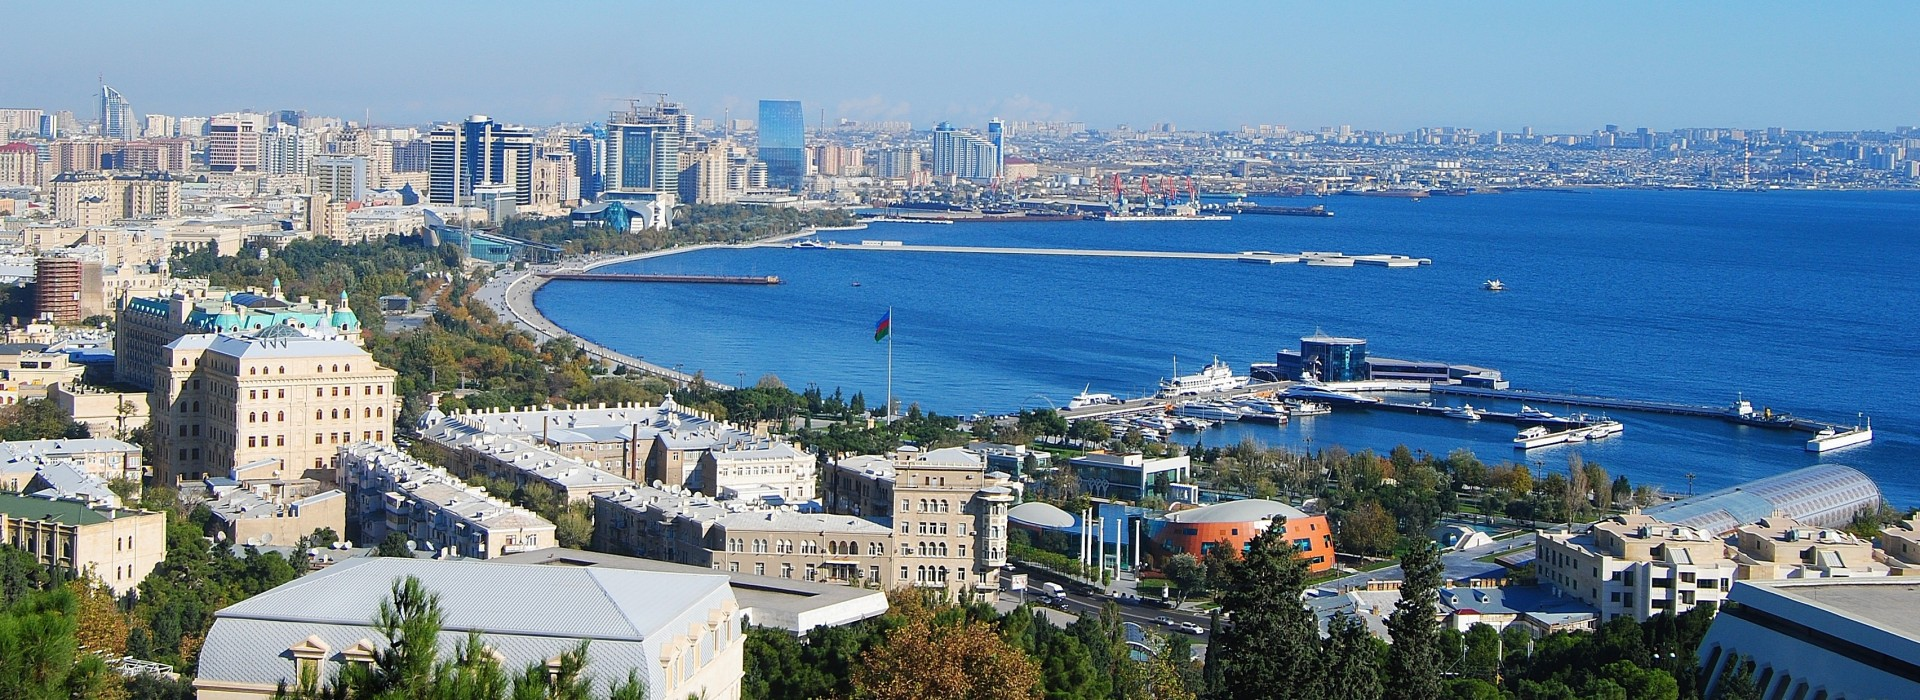 Travelling Azerbaijan - Tours and Trips in Azerbaijan